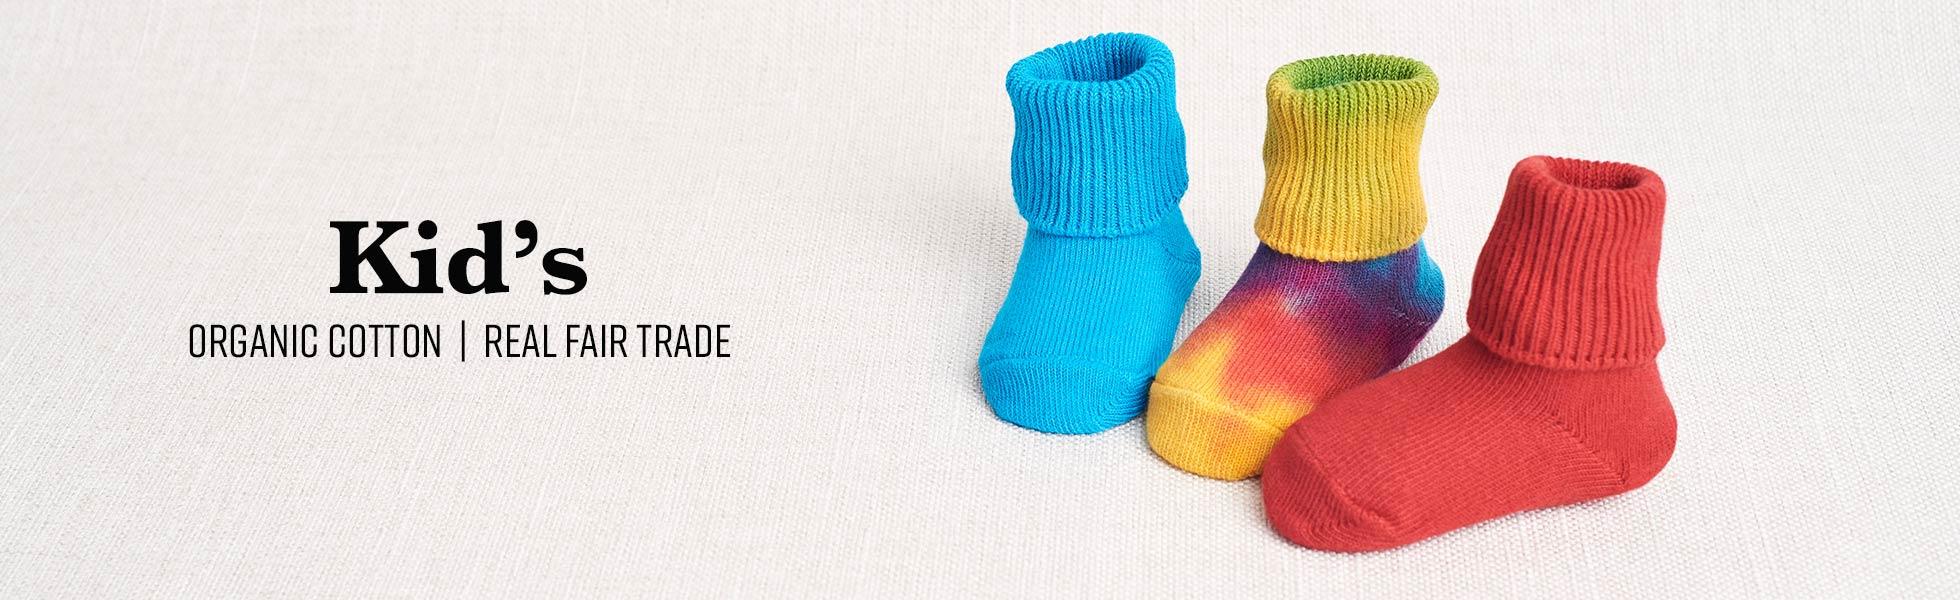 Organic Cotton Baby Socks